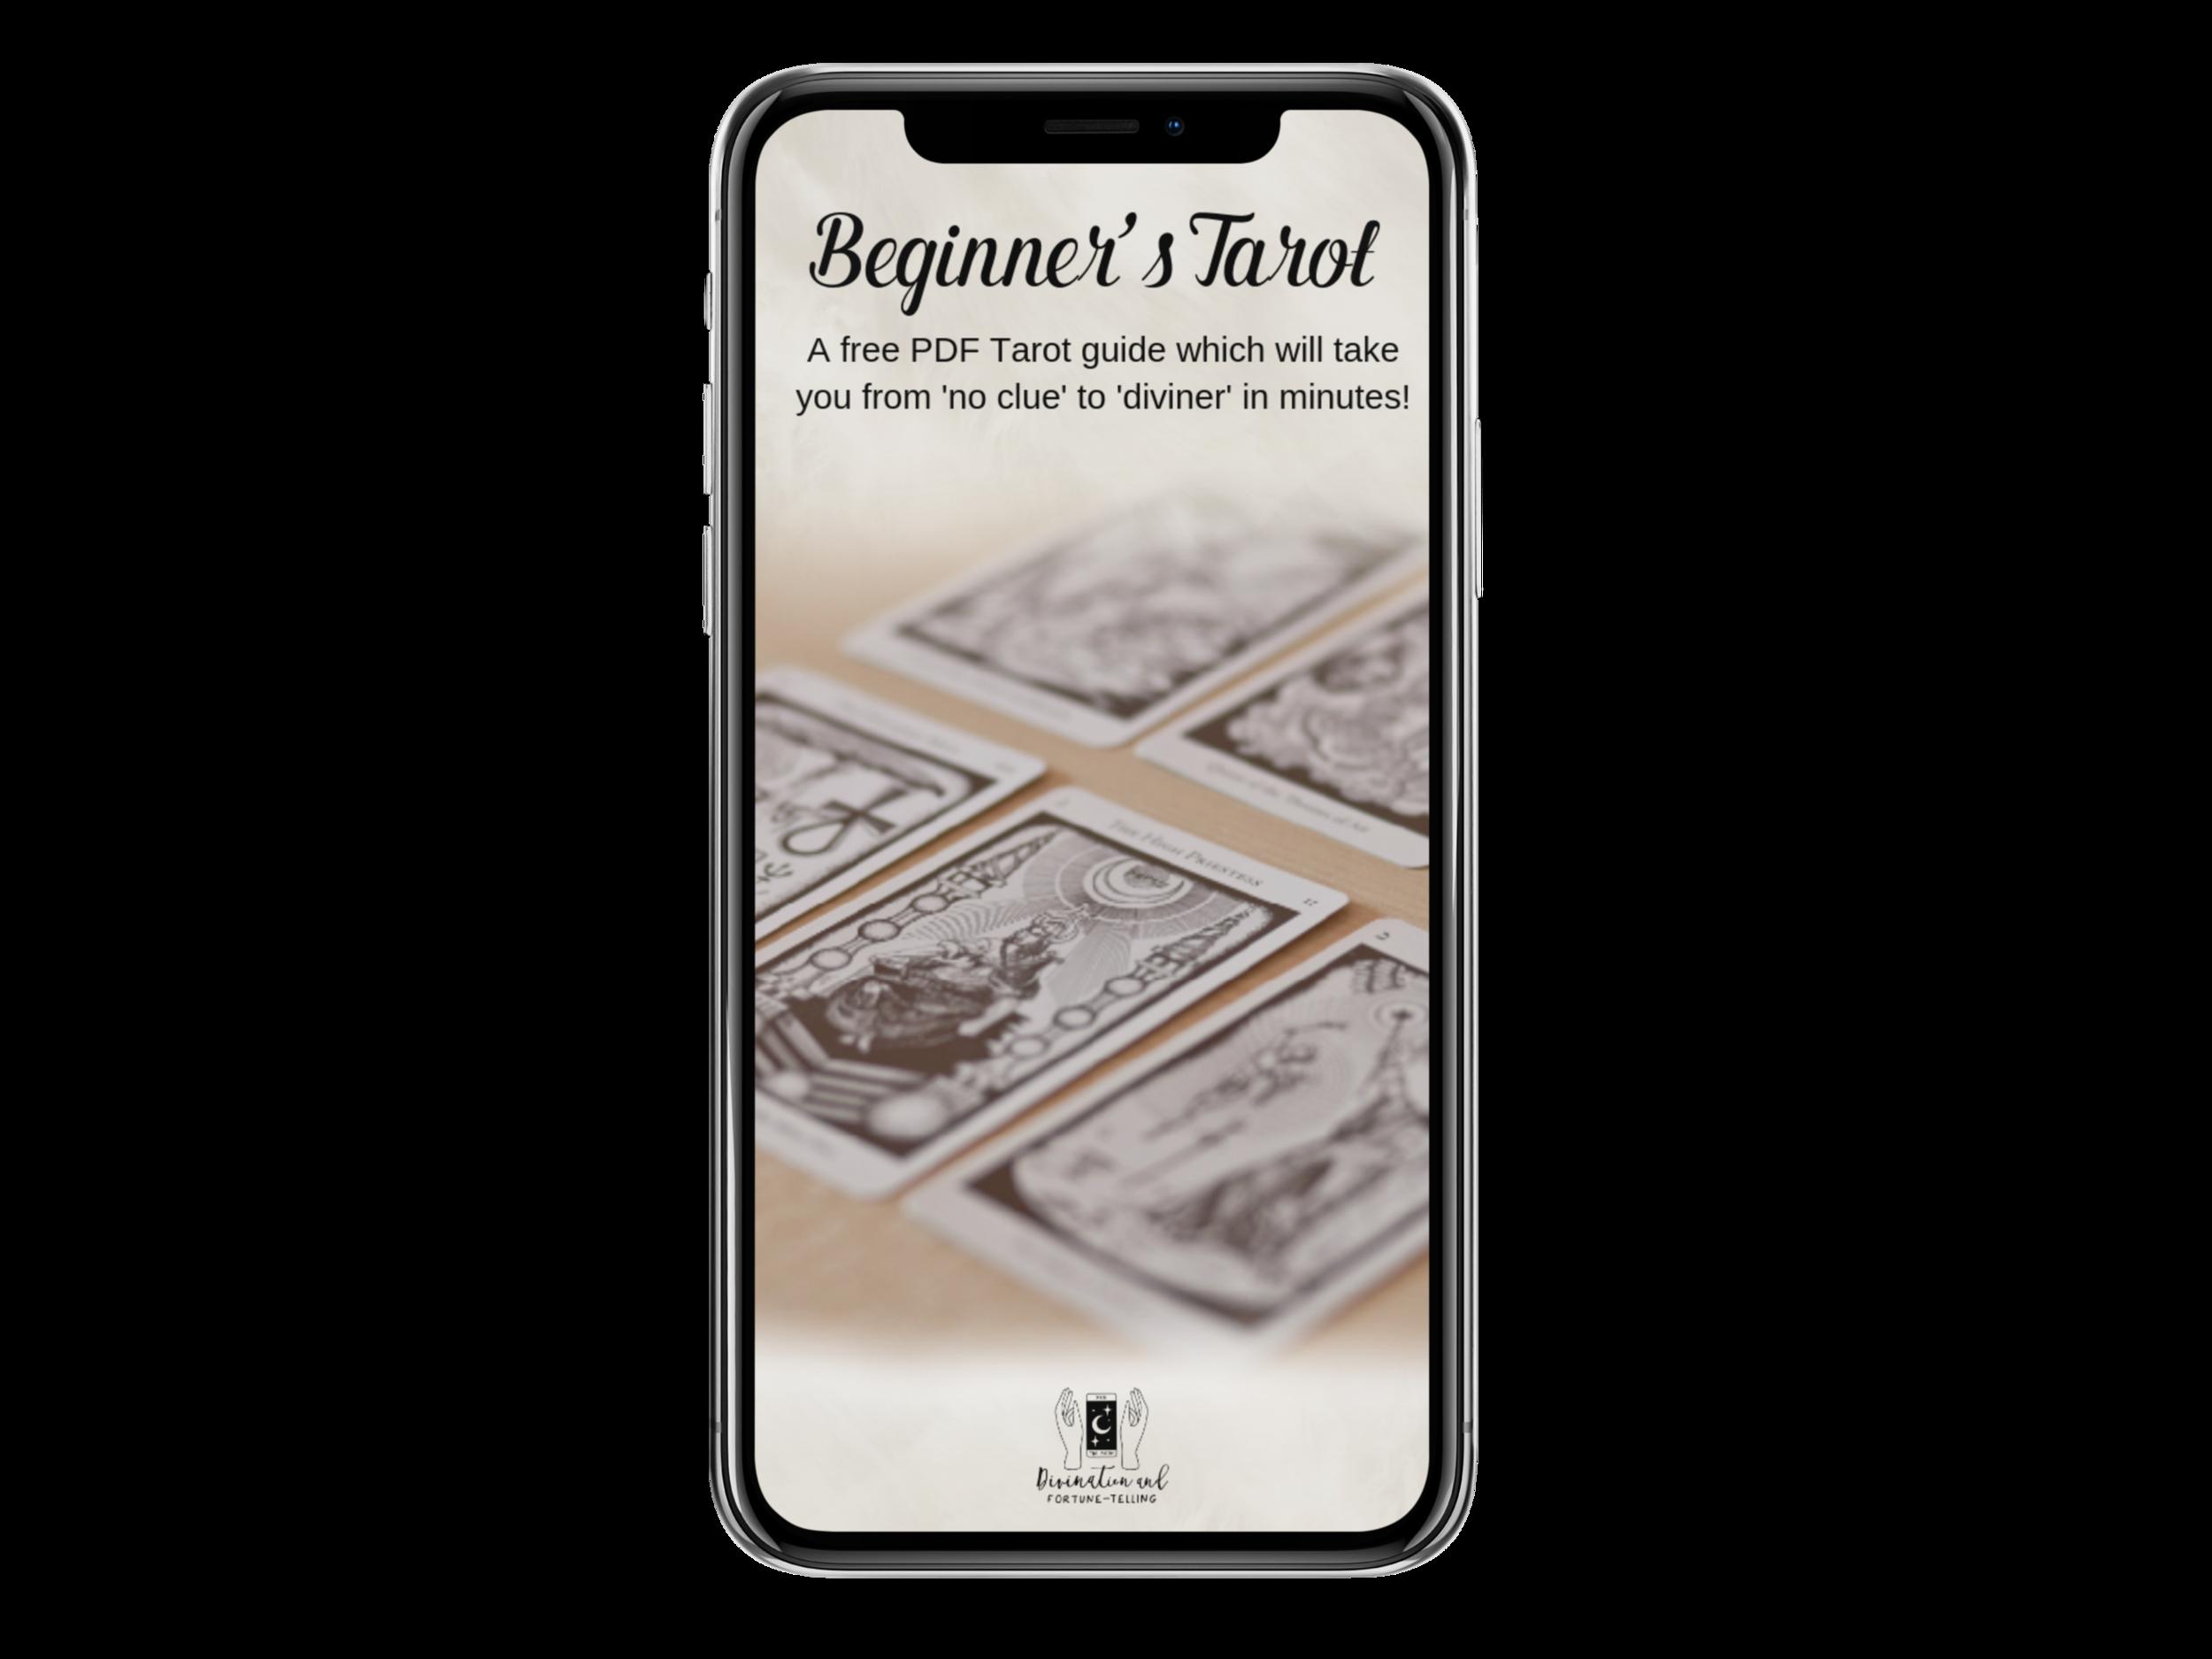 Beginner's Tarot PDF on Iphone.png